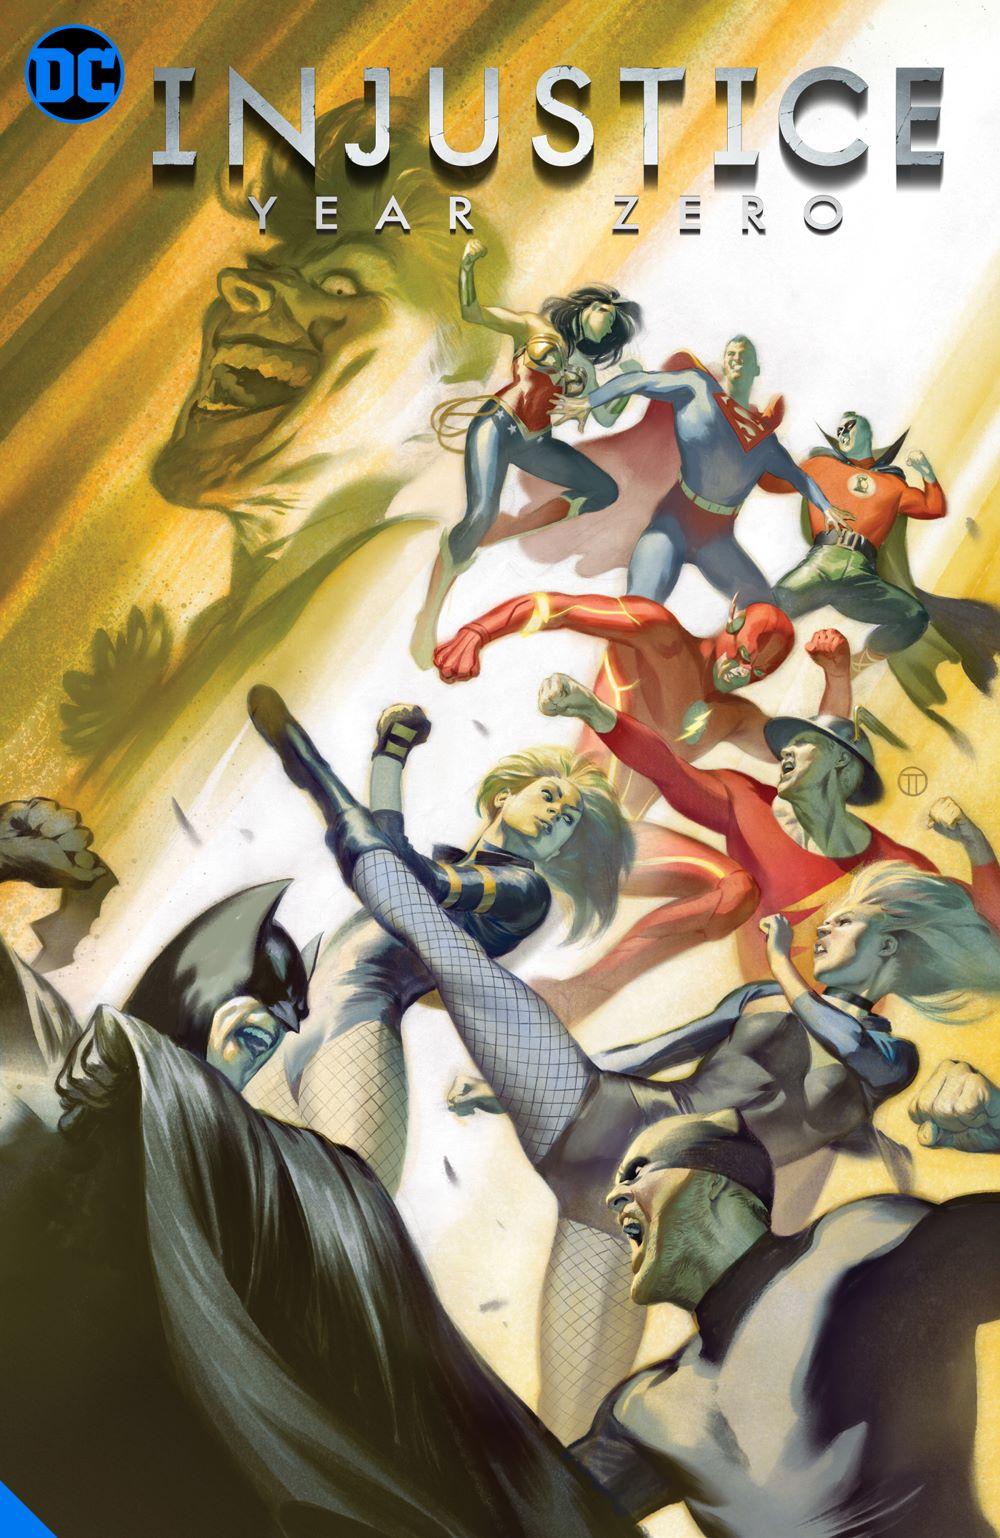 injusticeyearzero_adv DC Comics June 2021 Solicitations